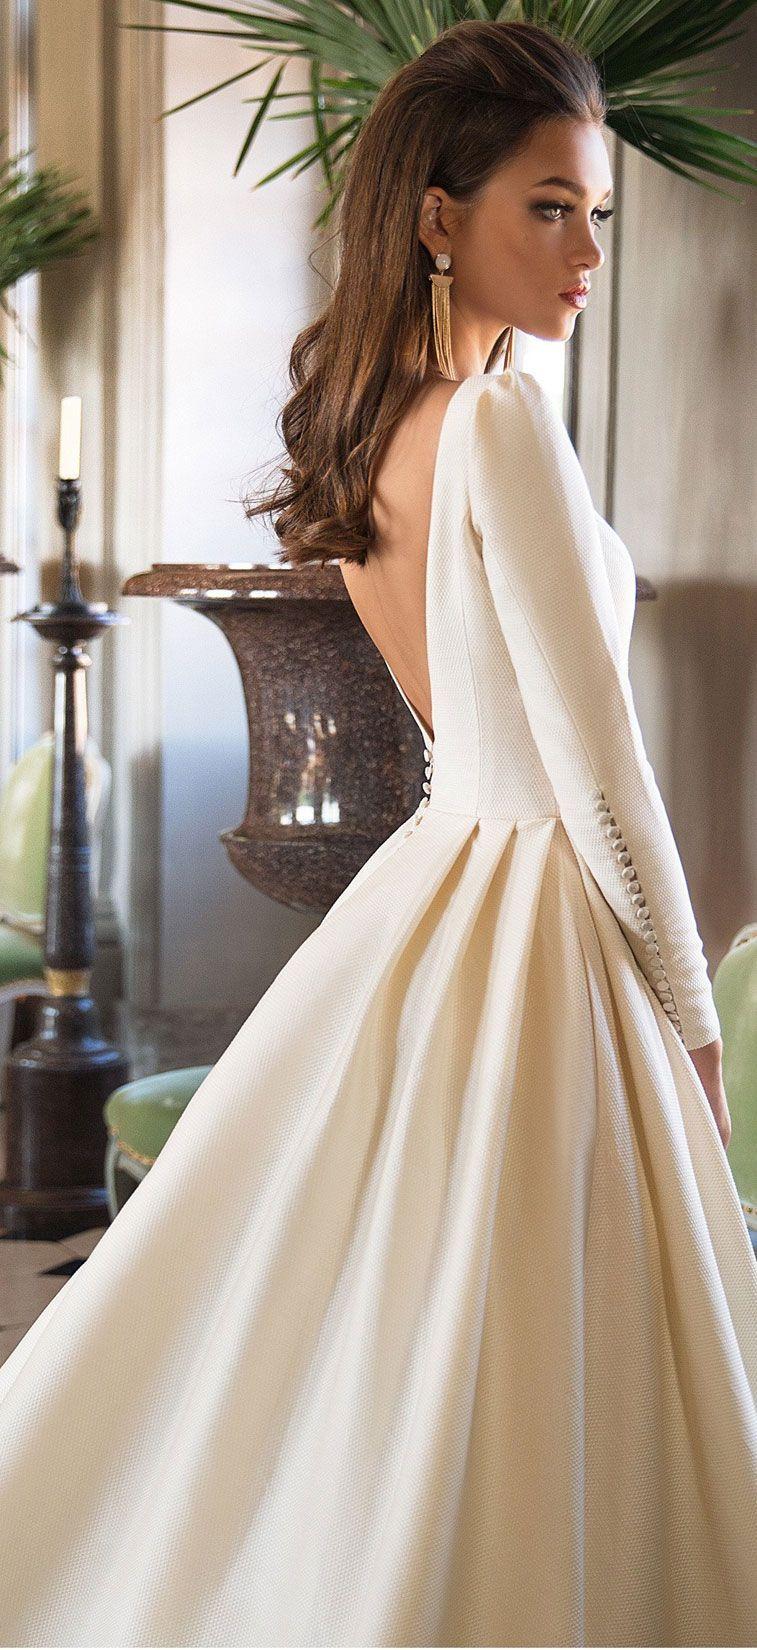 Wedding dress lace sleeves  Milla Nova Wedding Dress Inspiration  Dresses  Pinterest  Wedding